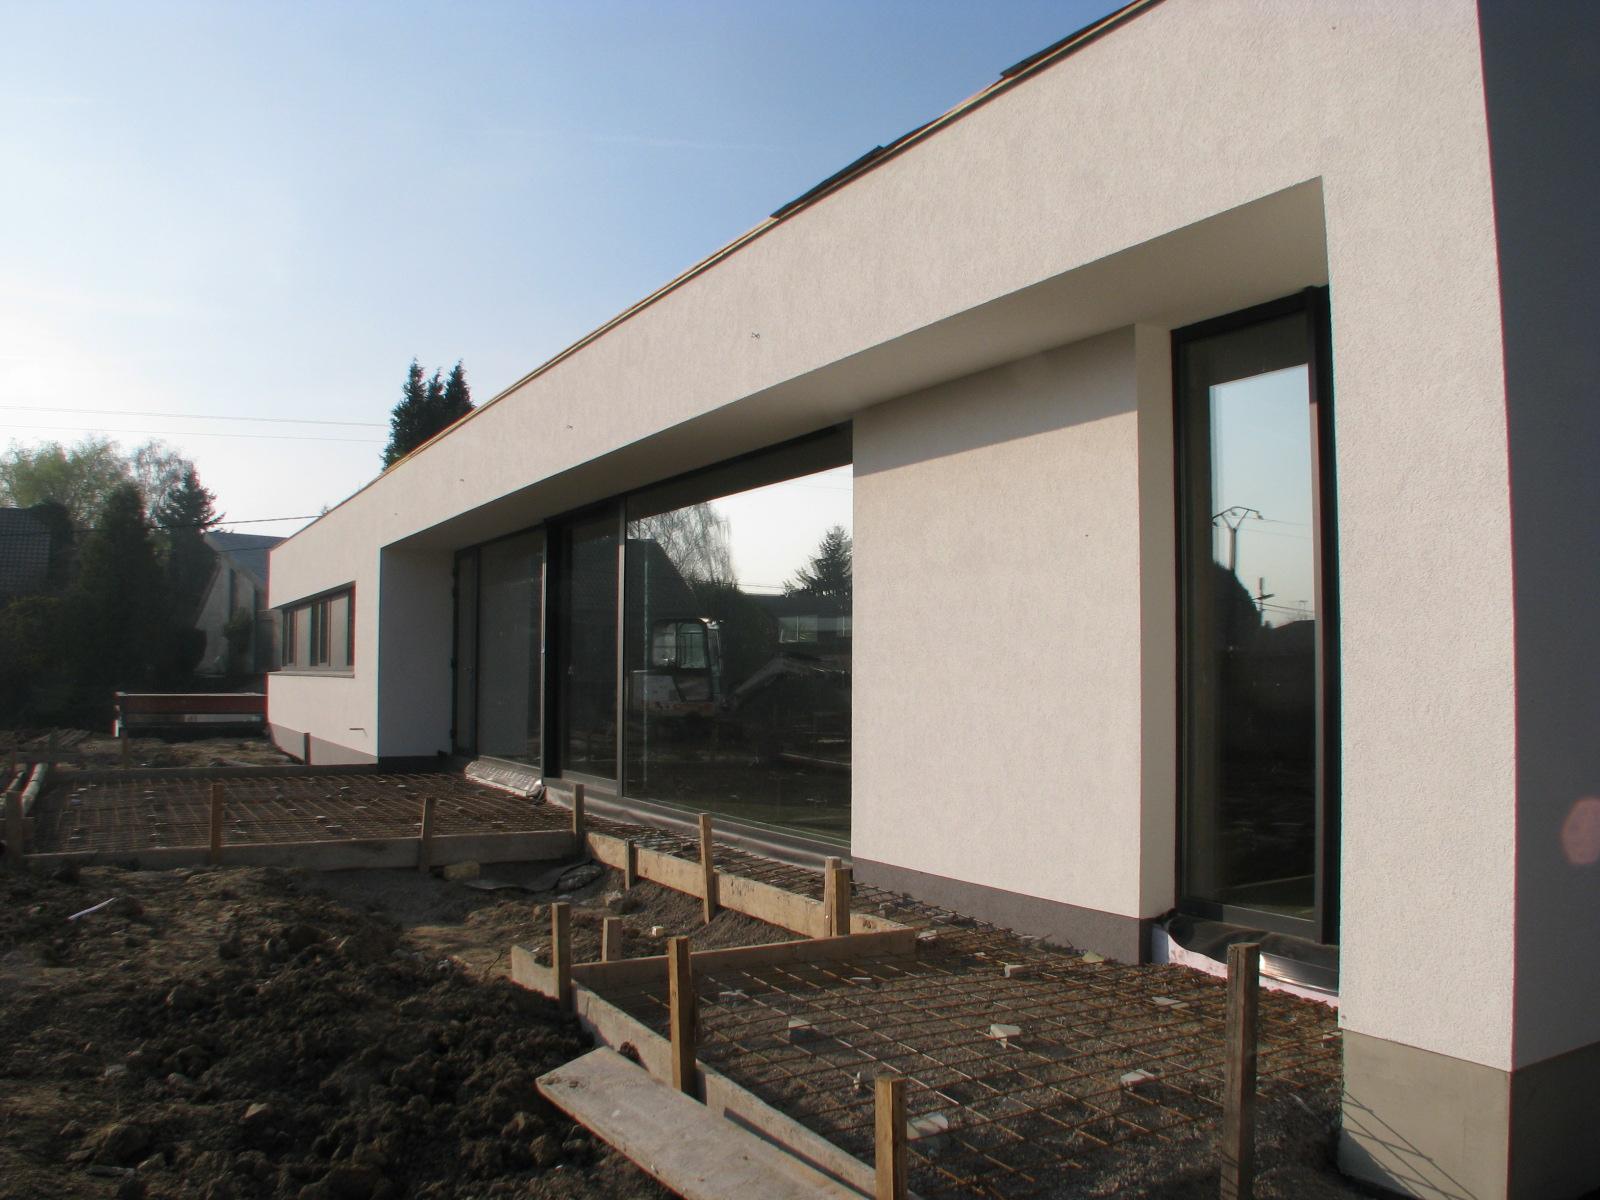 architecte | dune Architecture architecte brabant wallon